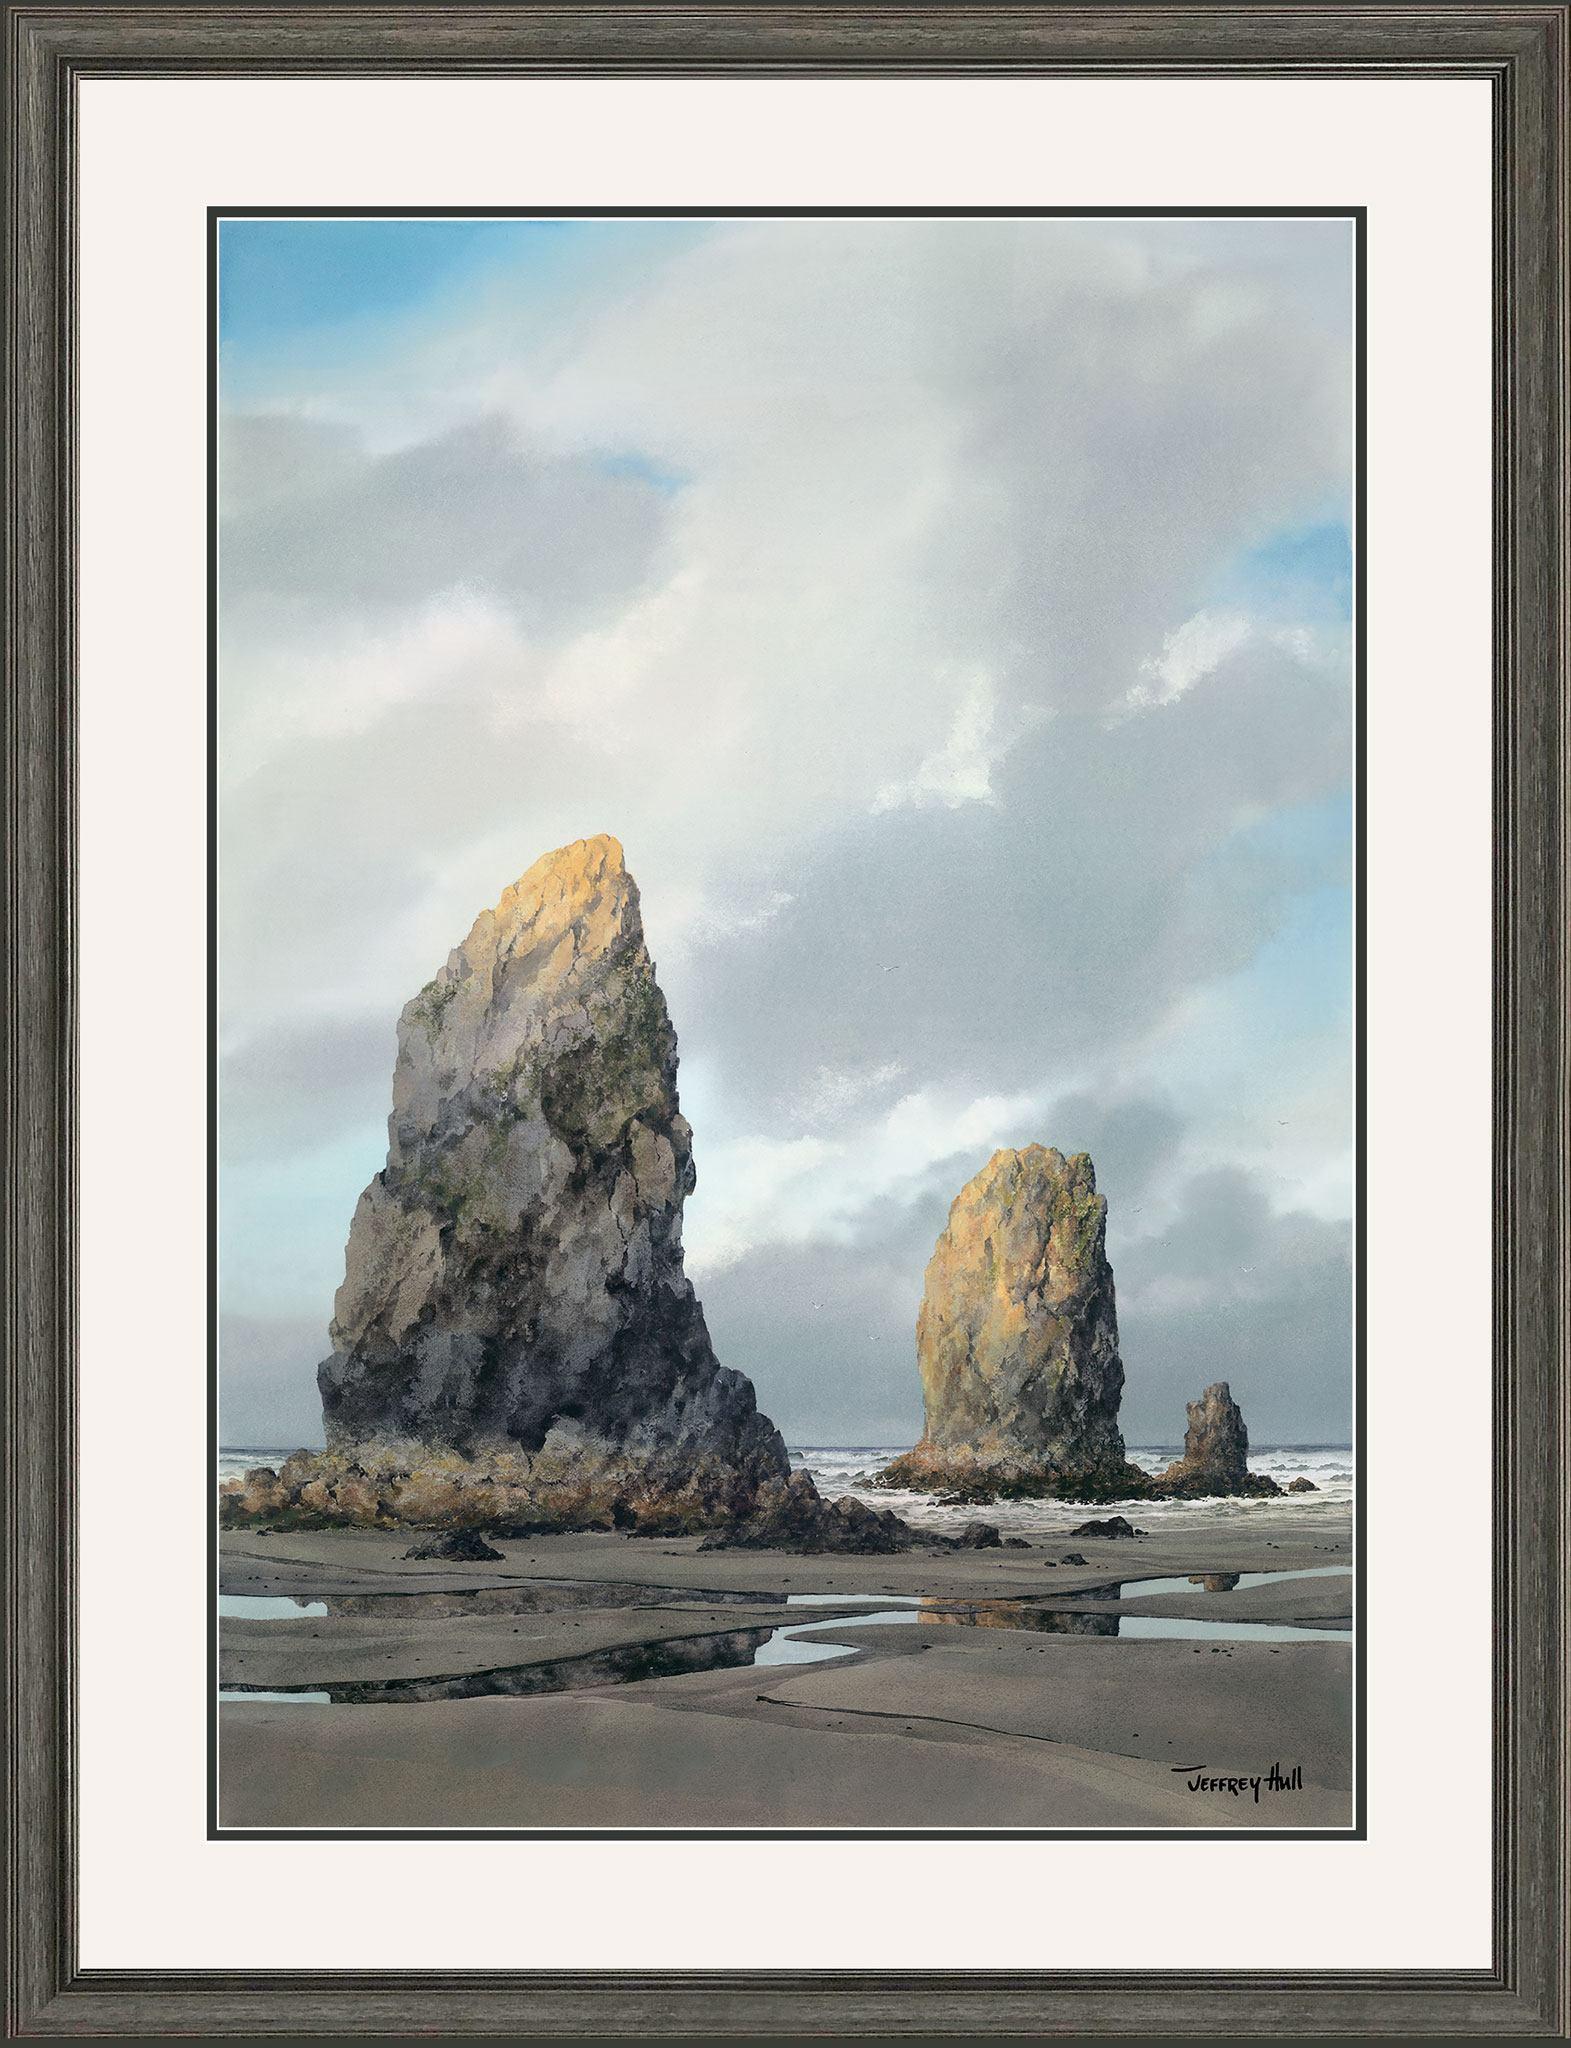 Minus-Tide-LimEd-Cascade-Talc-Dark-Shale-4-Website-2021